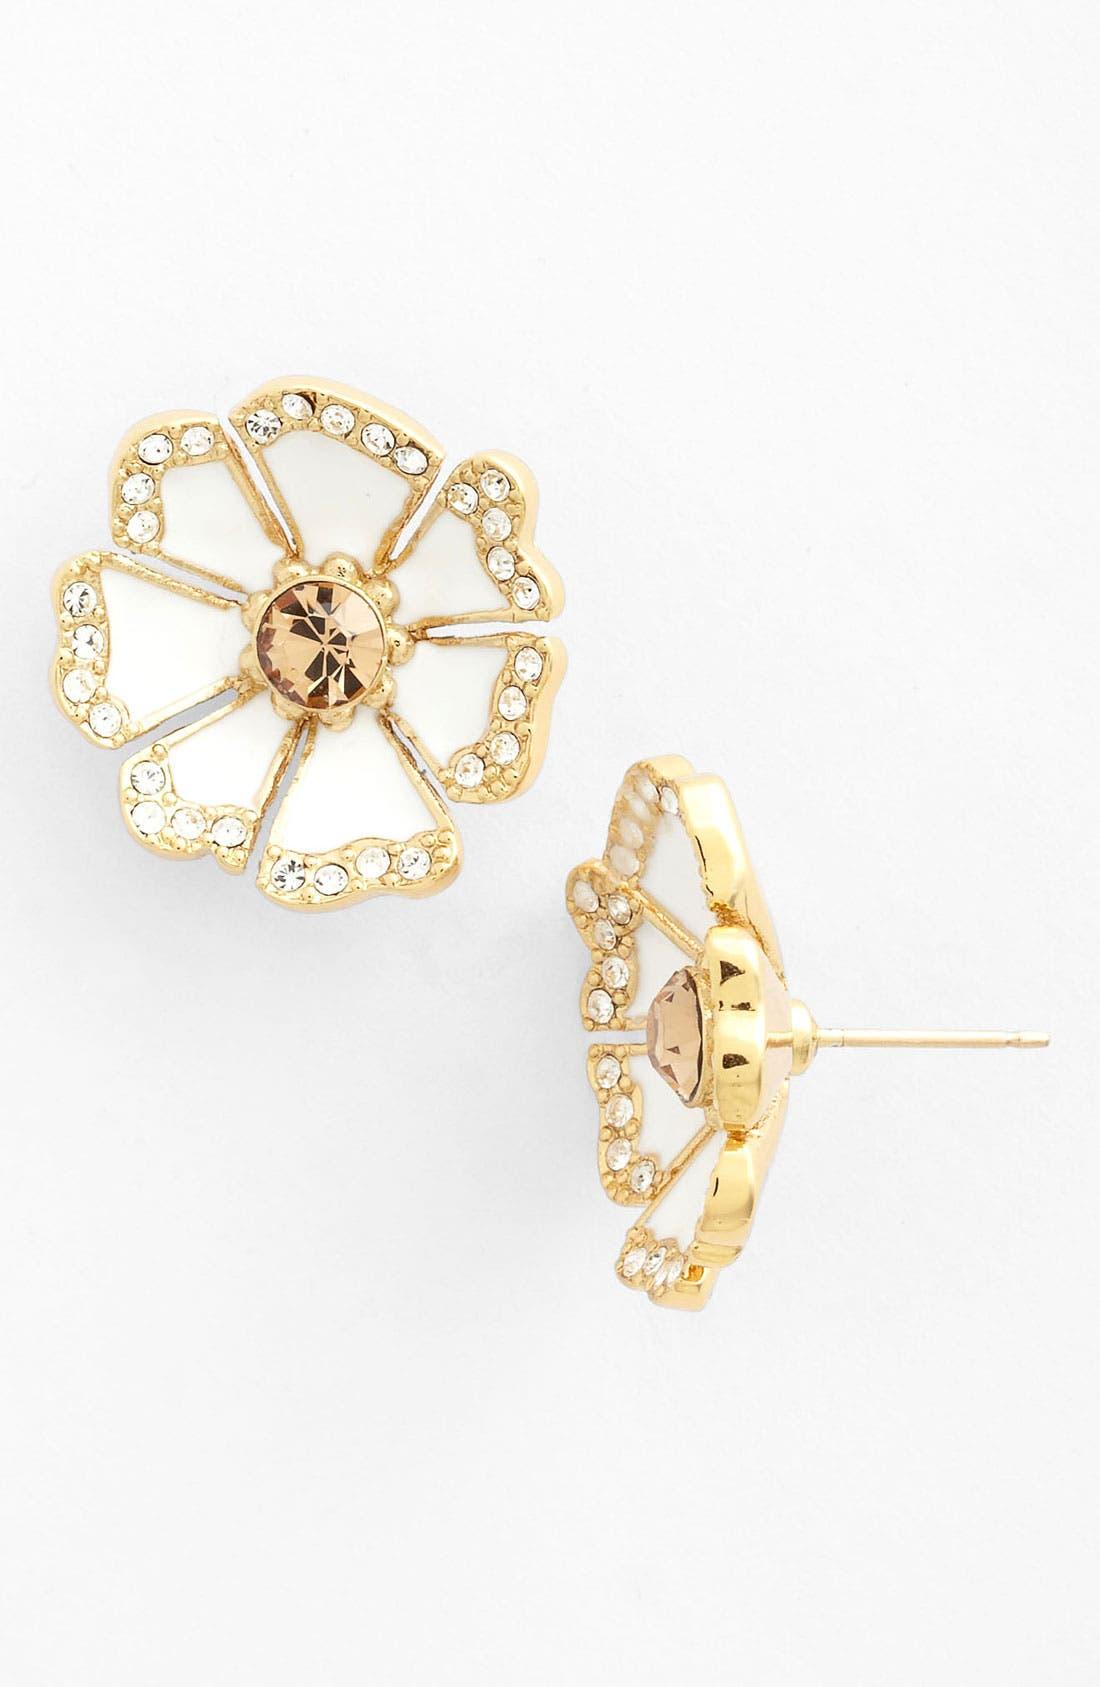 Main Image - kate spade new york 'garden grove' stud earrings